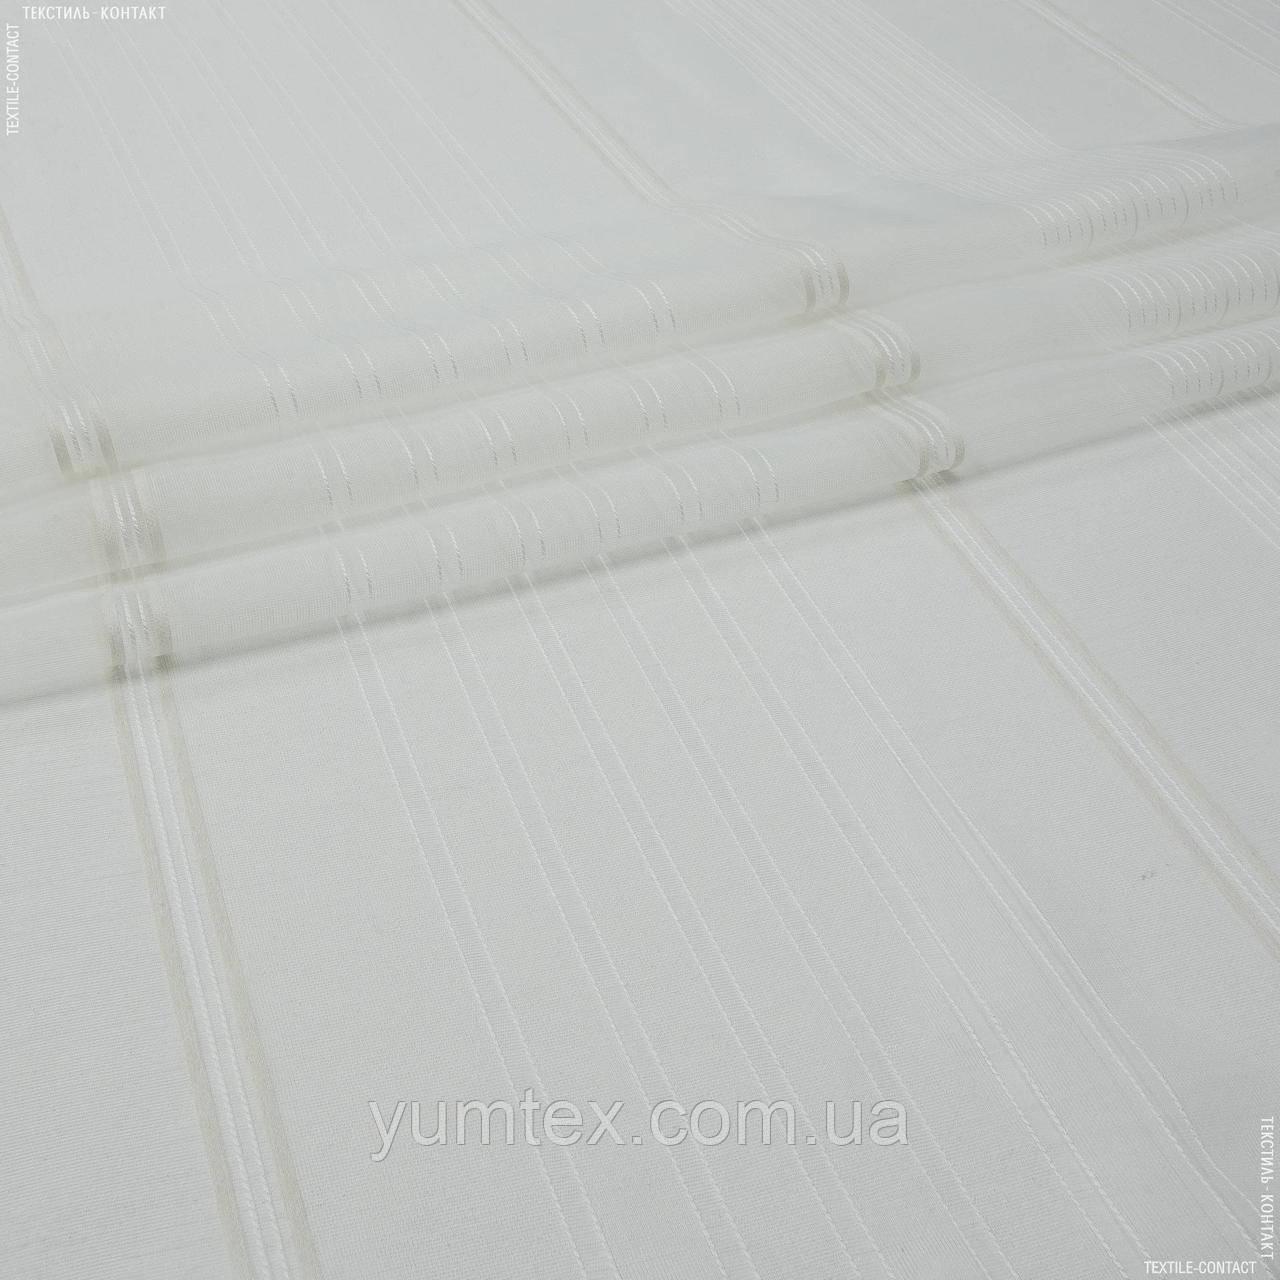 Тюль-кисея с  утяжелителем мистеро/mistero  137319